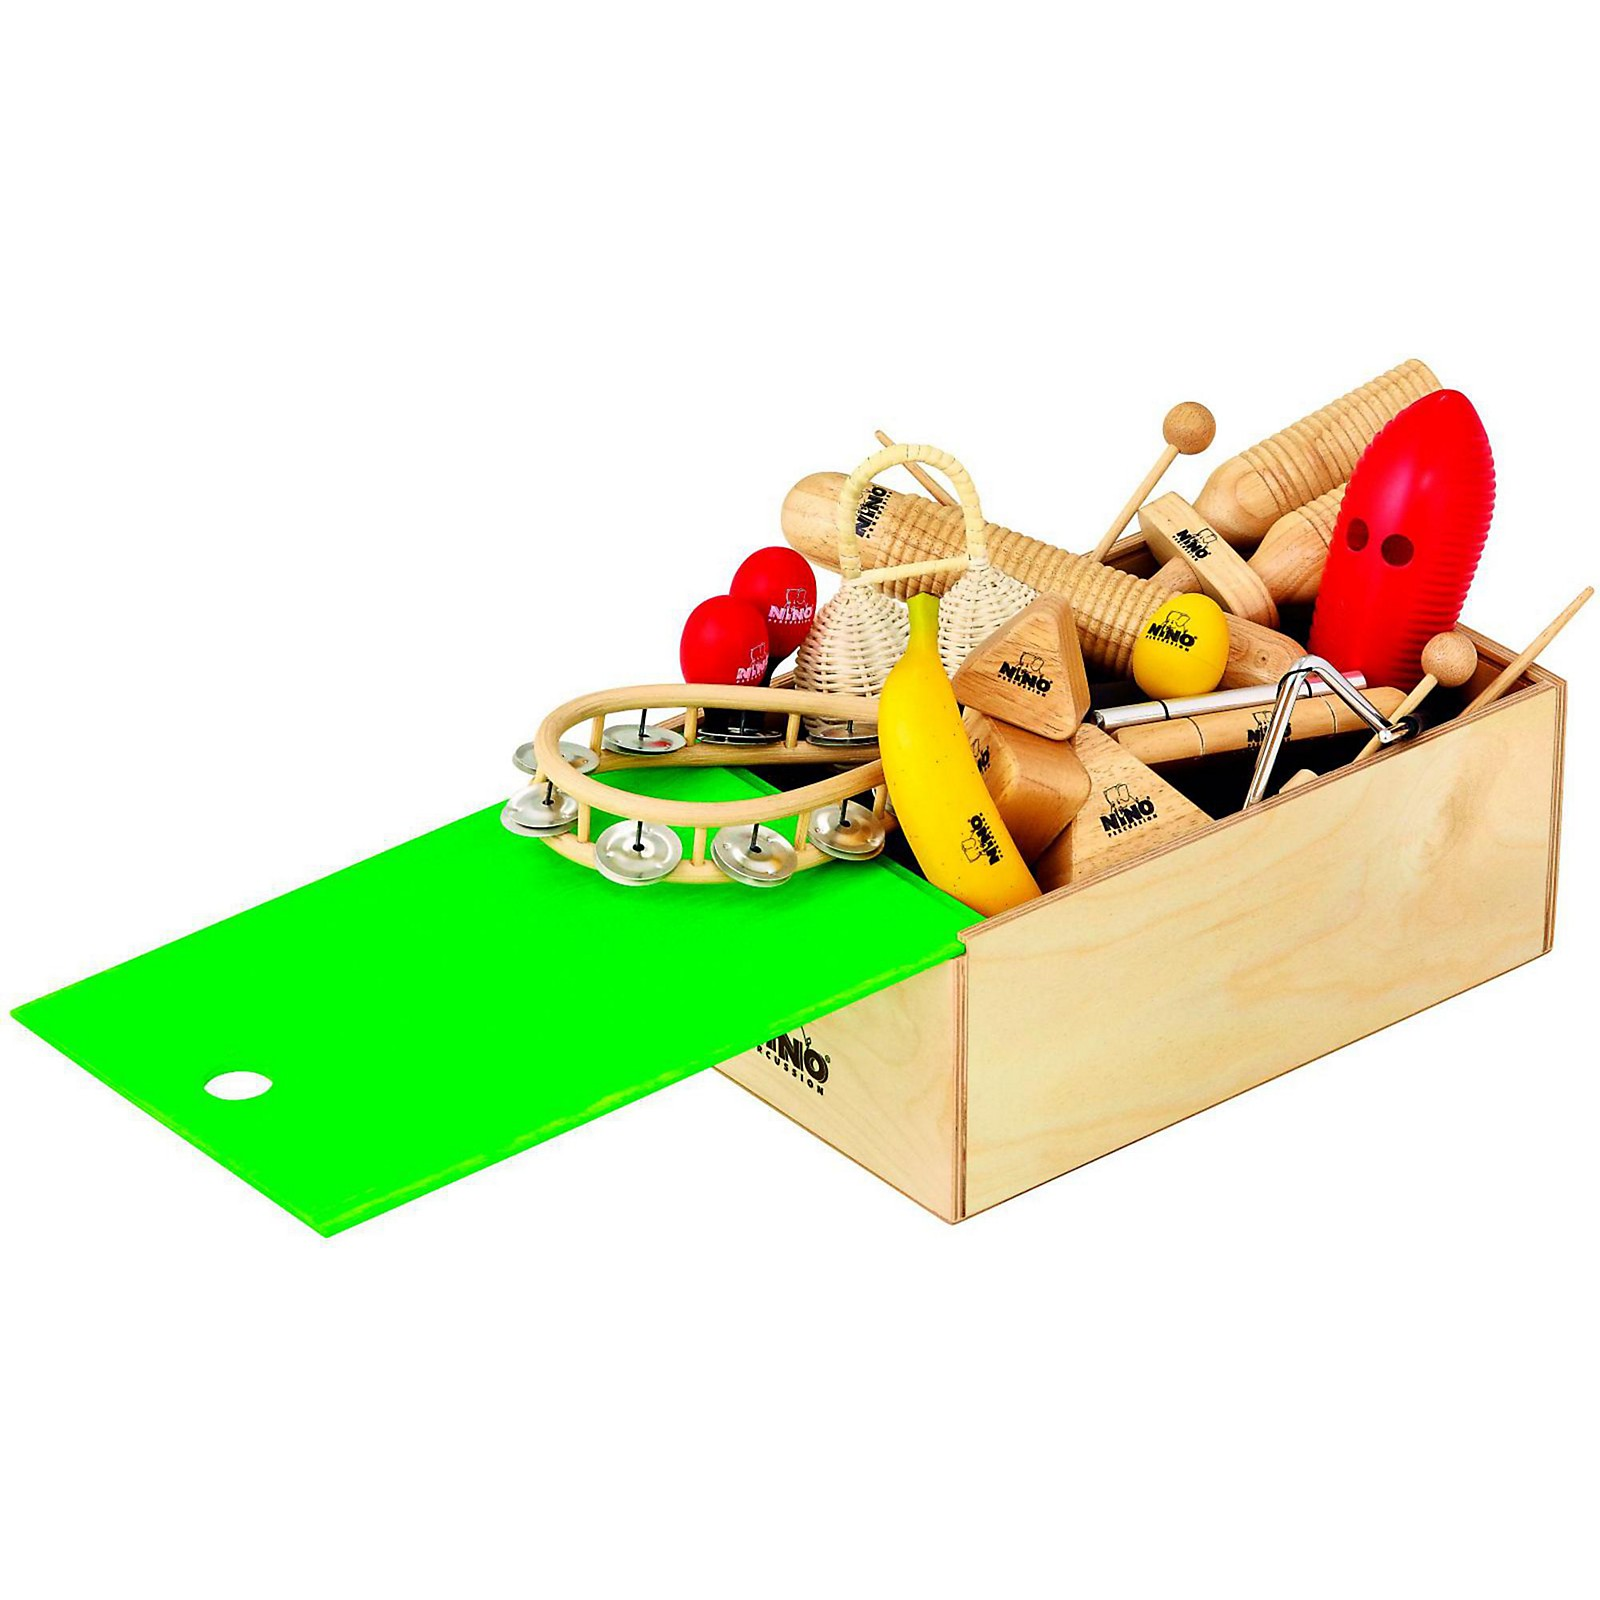 Open Box Nino 15-Piece Rhythm Assortment with Box